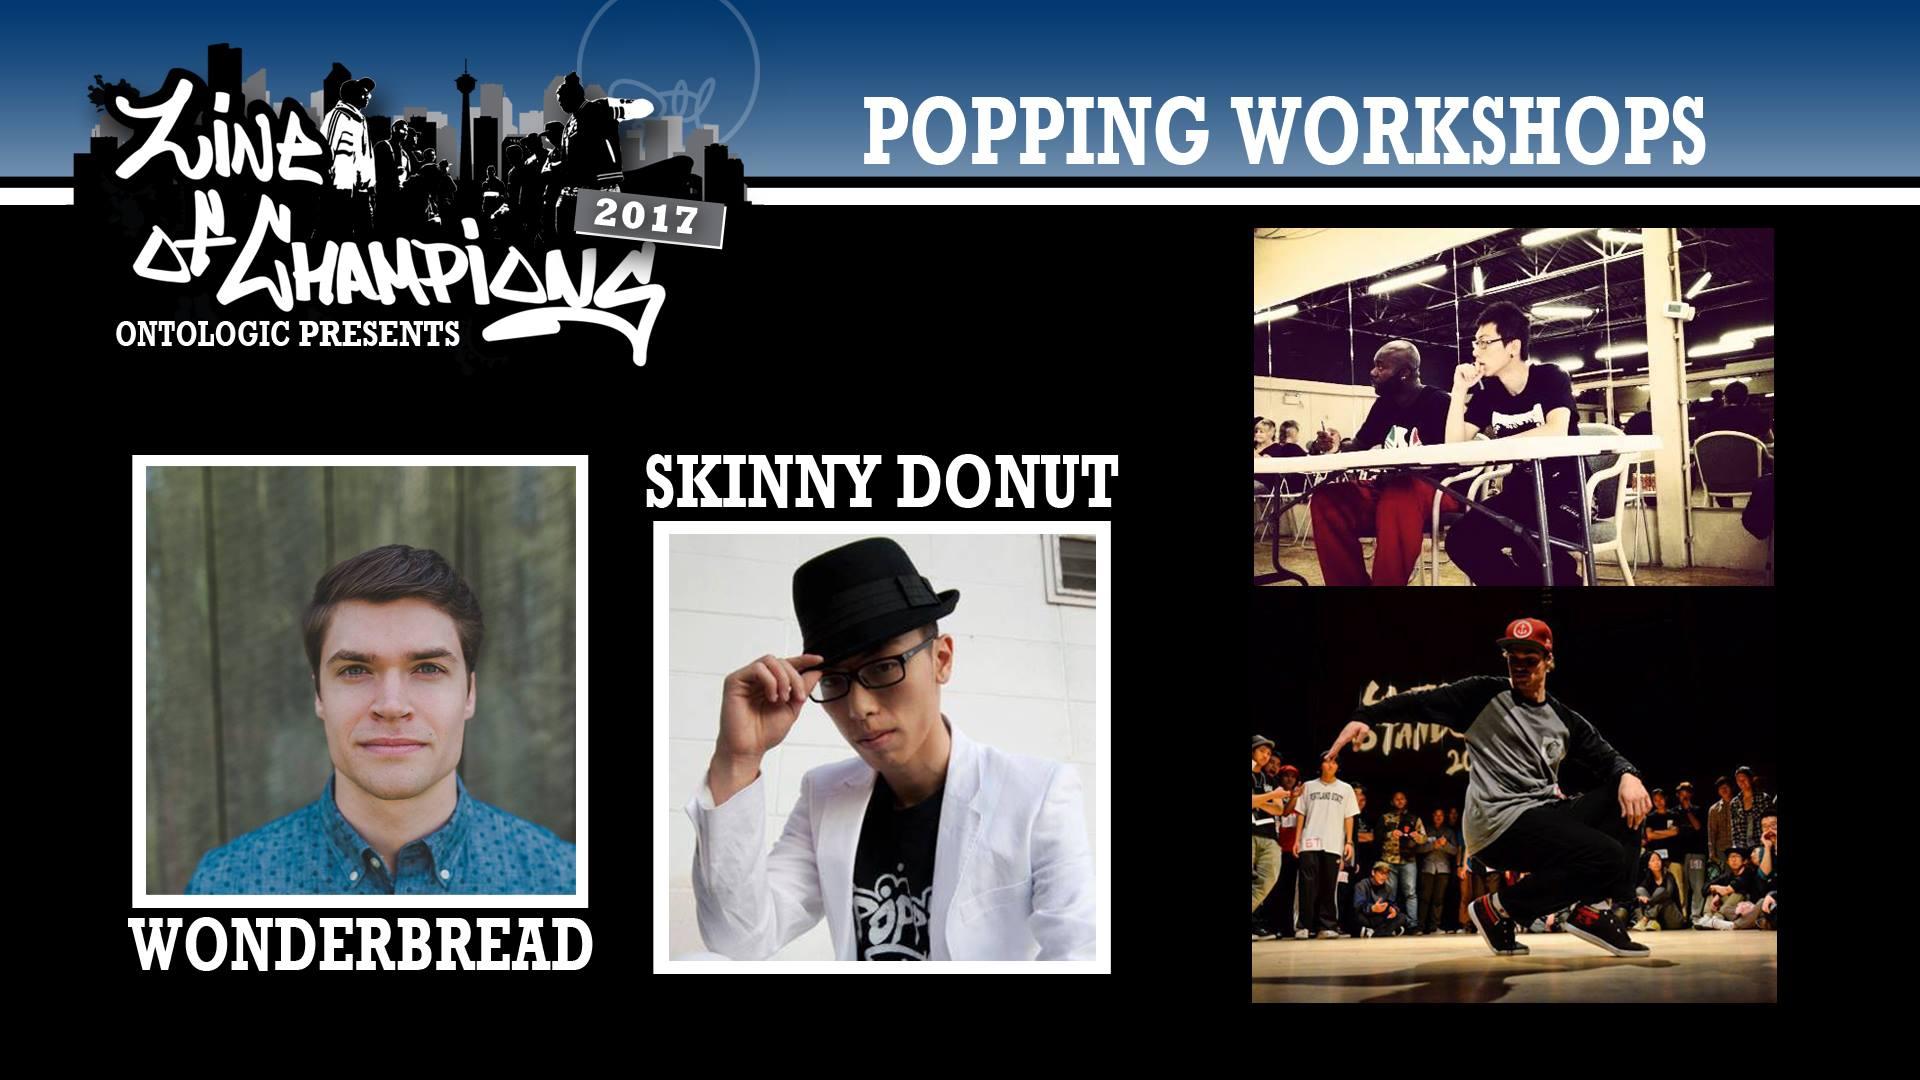 line-of-champions-popping-workshop-wonderbread-skinny-donut-ontologic-pulse-studios-hip-hop-community